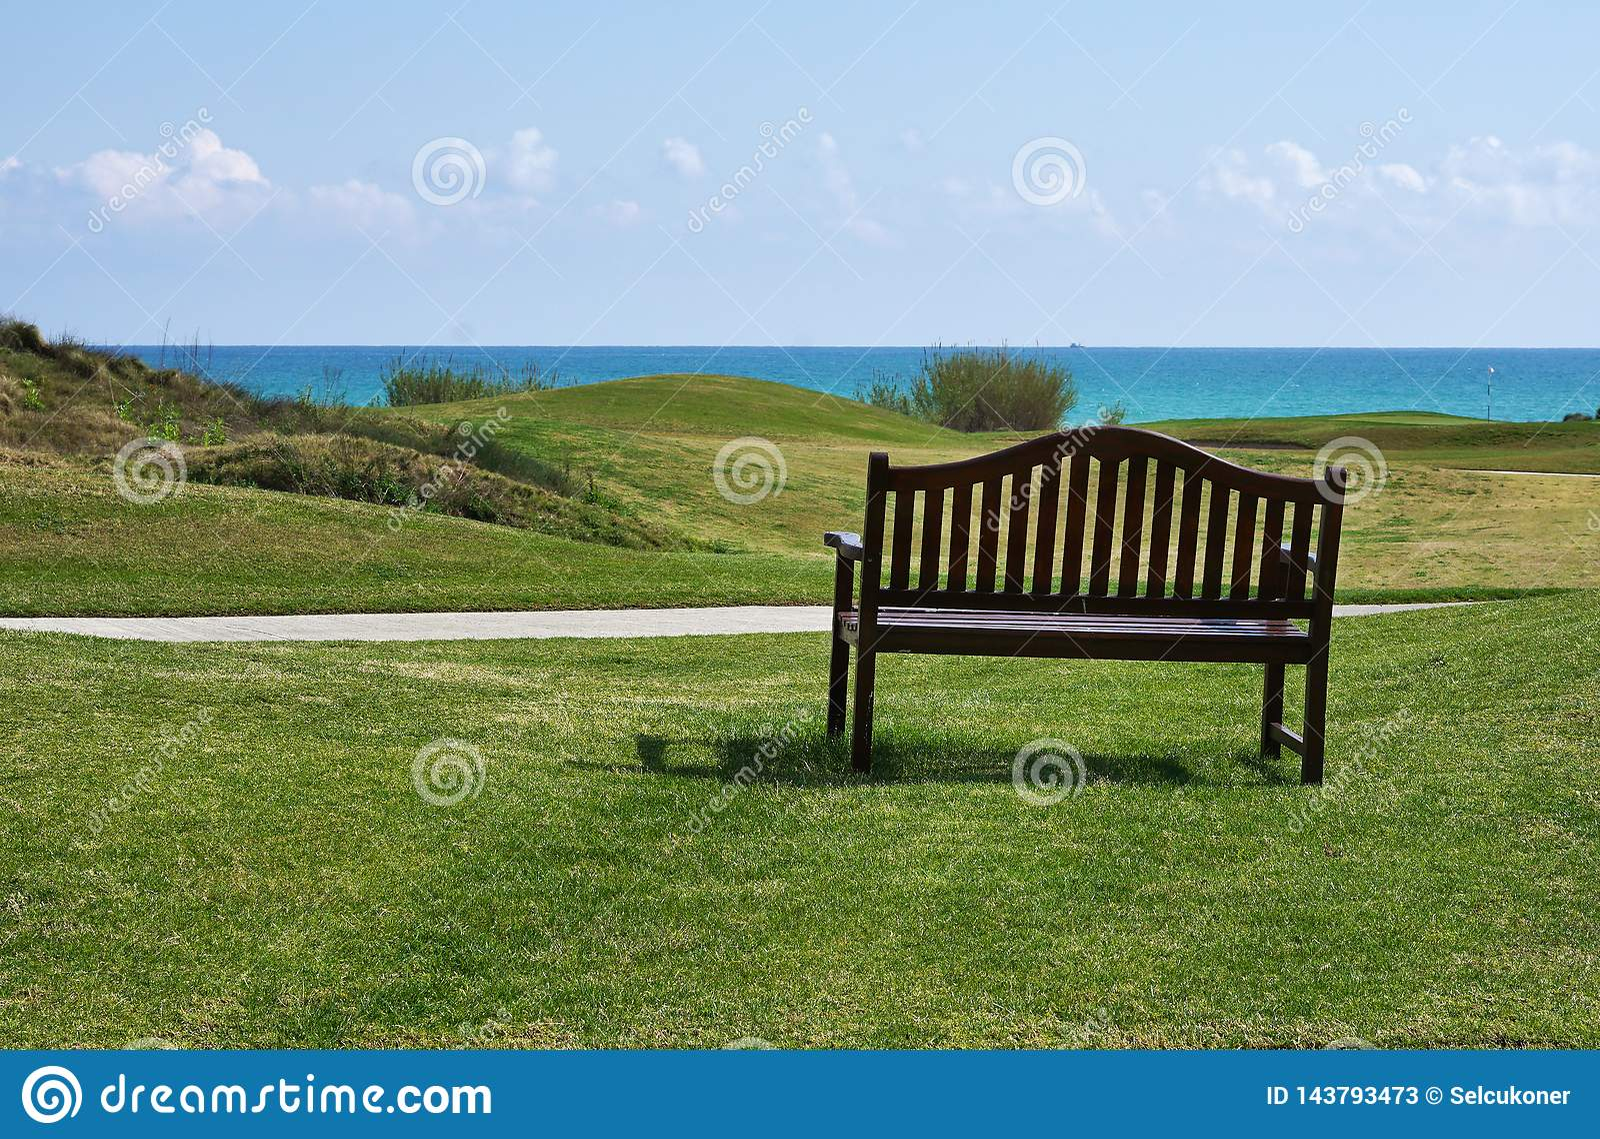 Golf course near beach